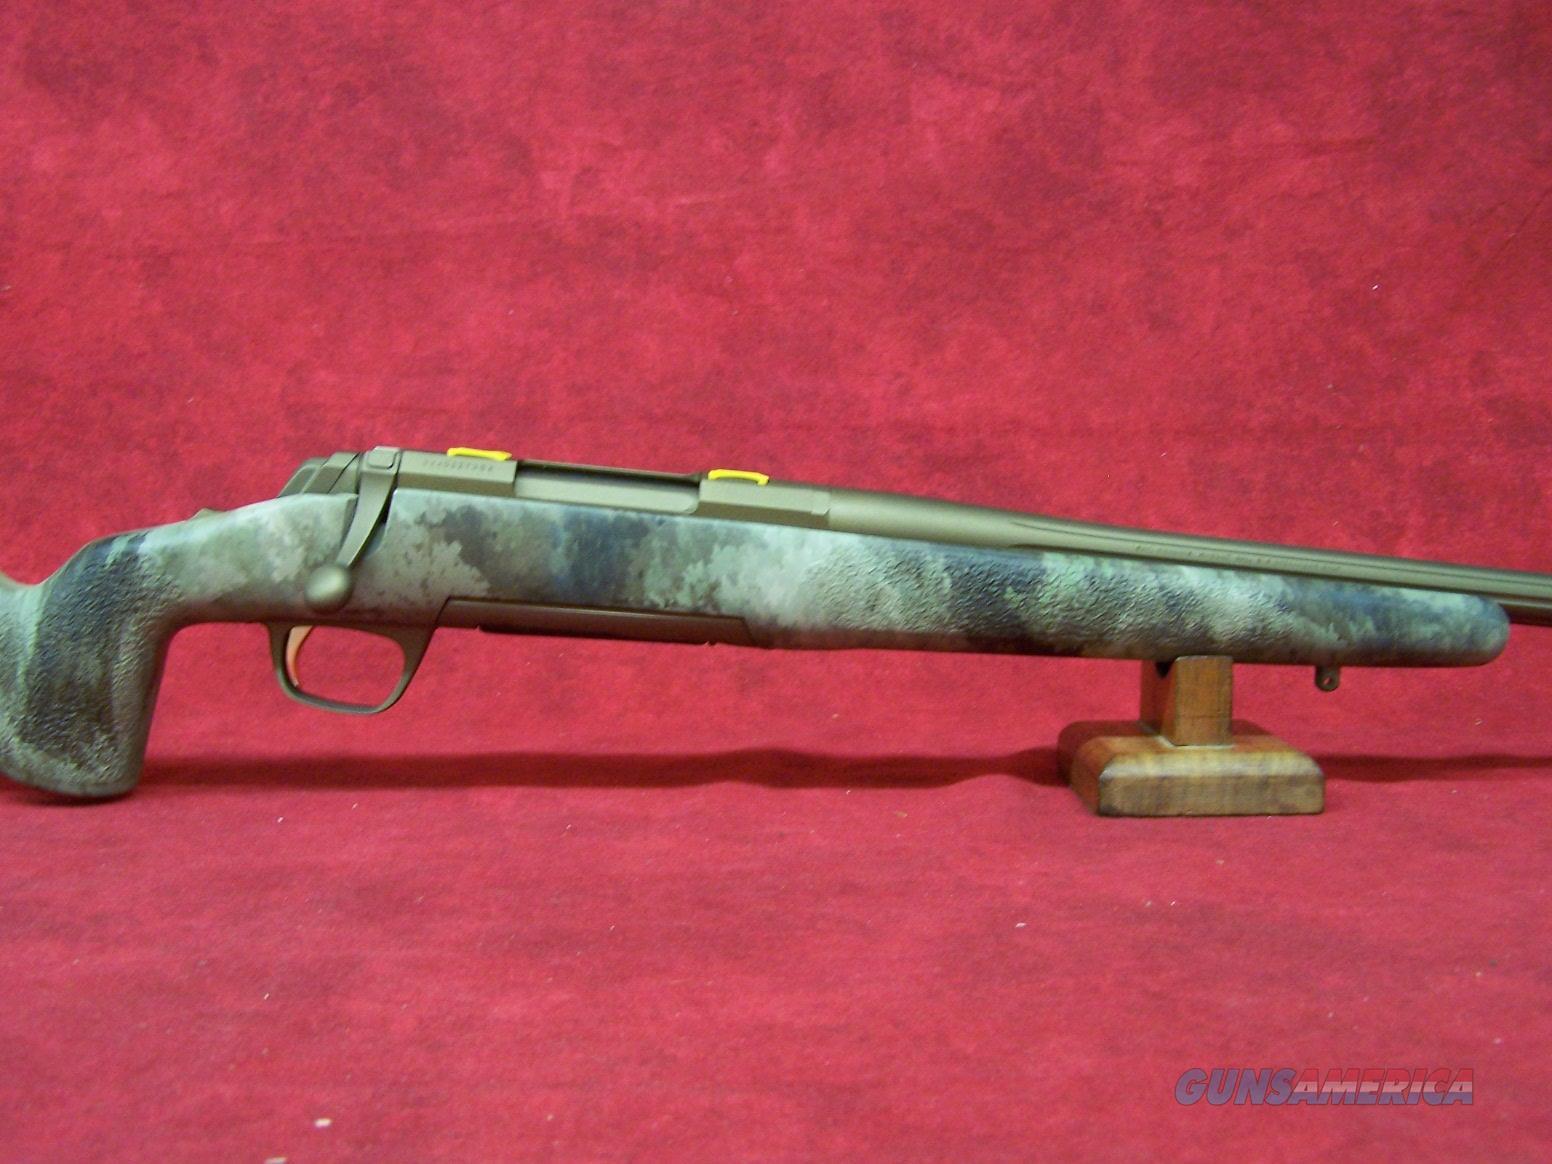 "Browning X-Bolt Hell's Canyon Long Range McMillan 6.5 Creedmoor 26"" Barrel (035395282)  Guns > Rifles > Browning Rifles > Bolt Action > Hunting > Blue"